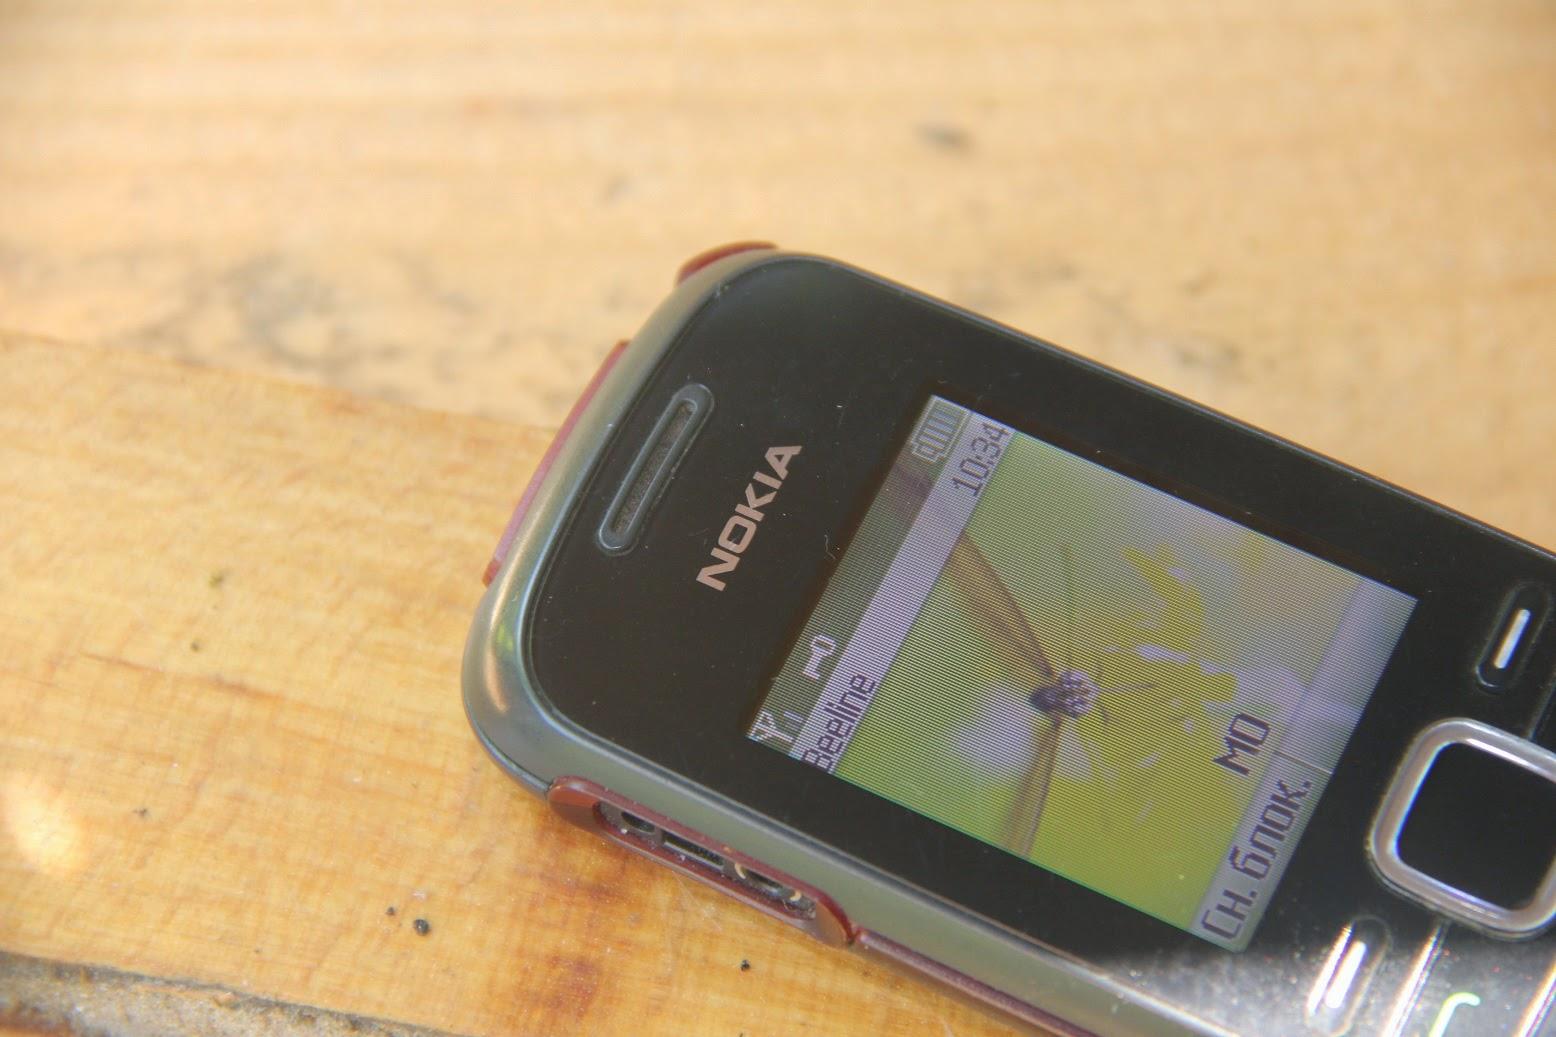 Антенна для сотового телефона свои руками фото 180